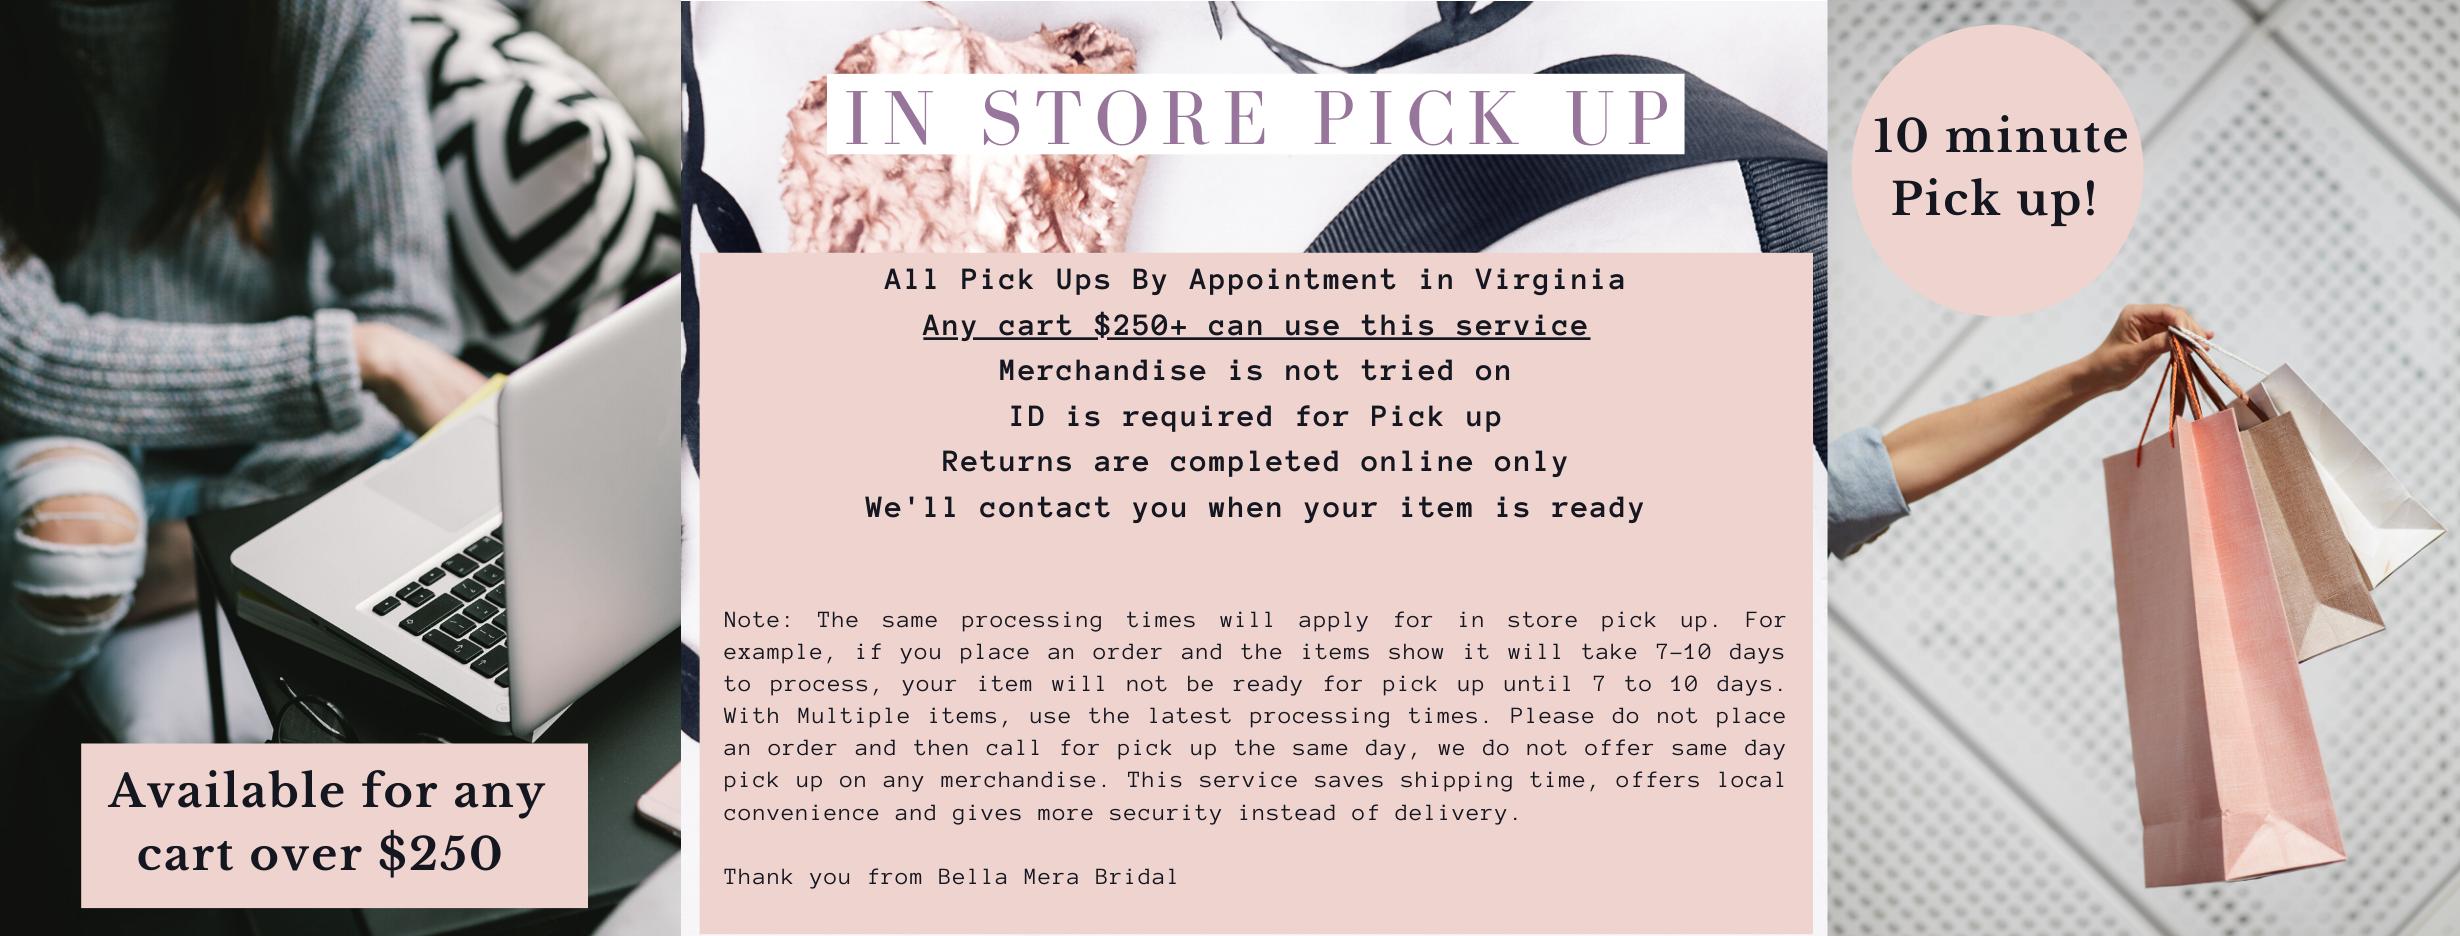 in-store-pick-up-bella-mera.png